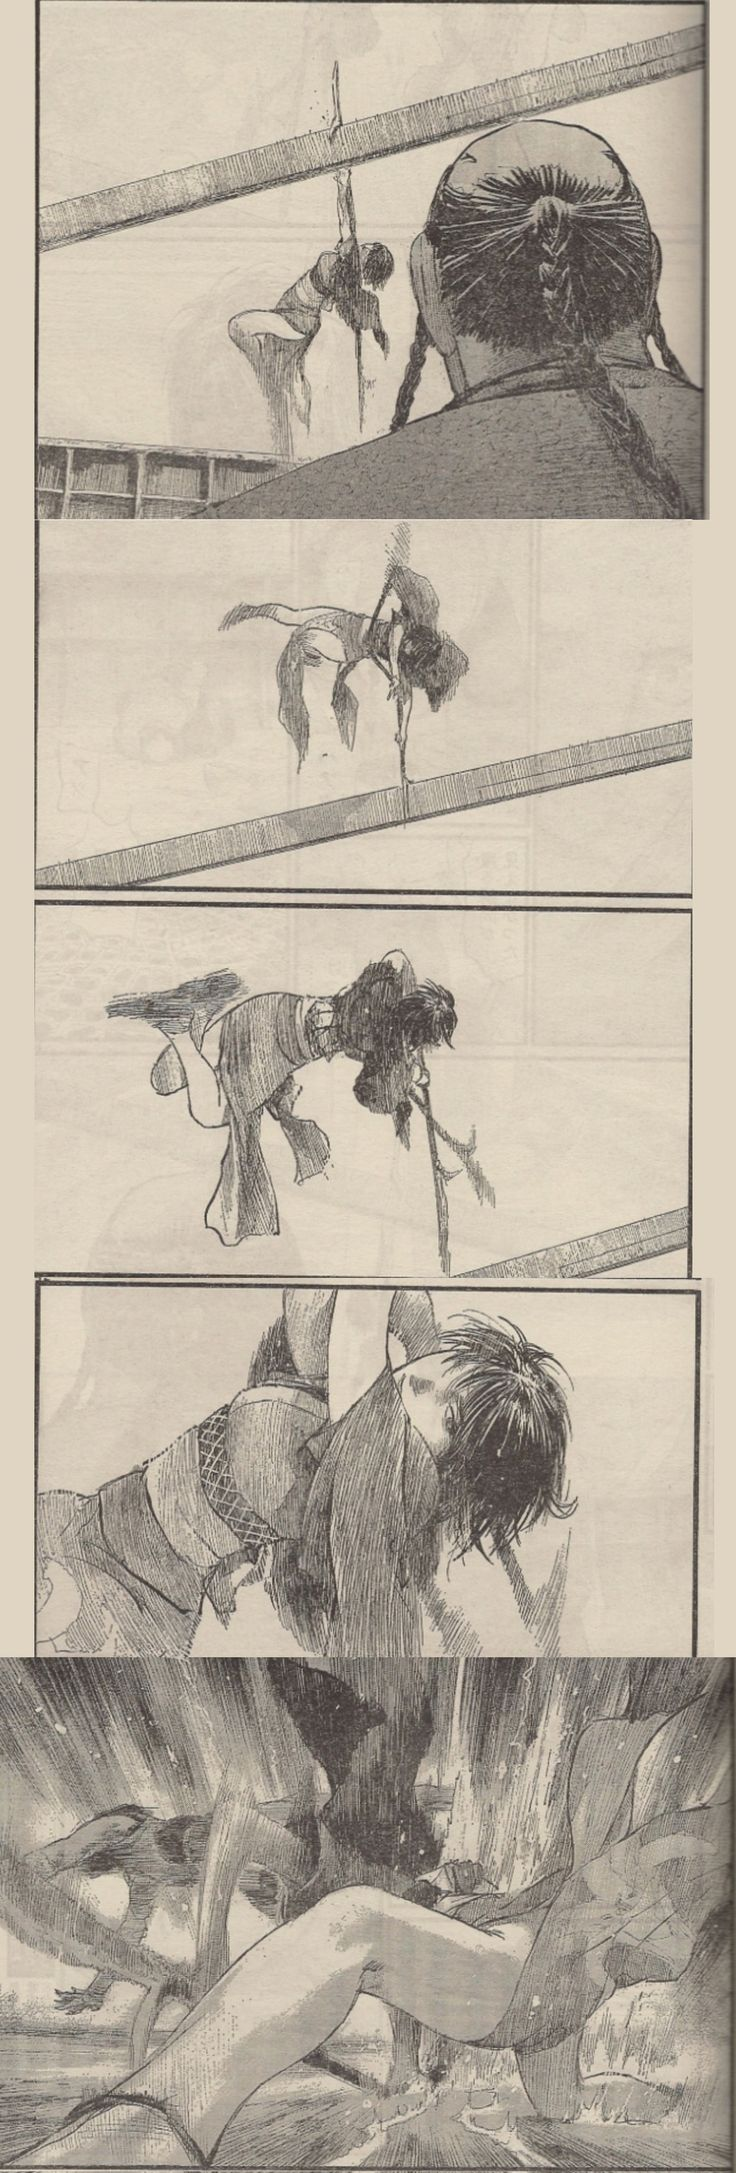 Blade of the immortal, Hiroaki Samura, Makie fight